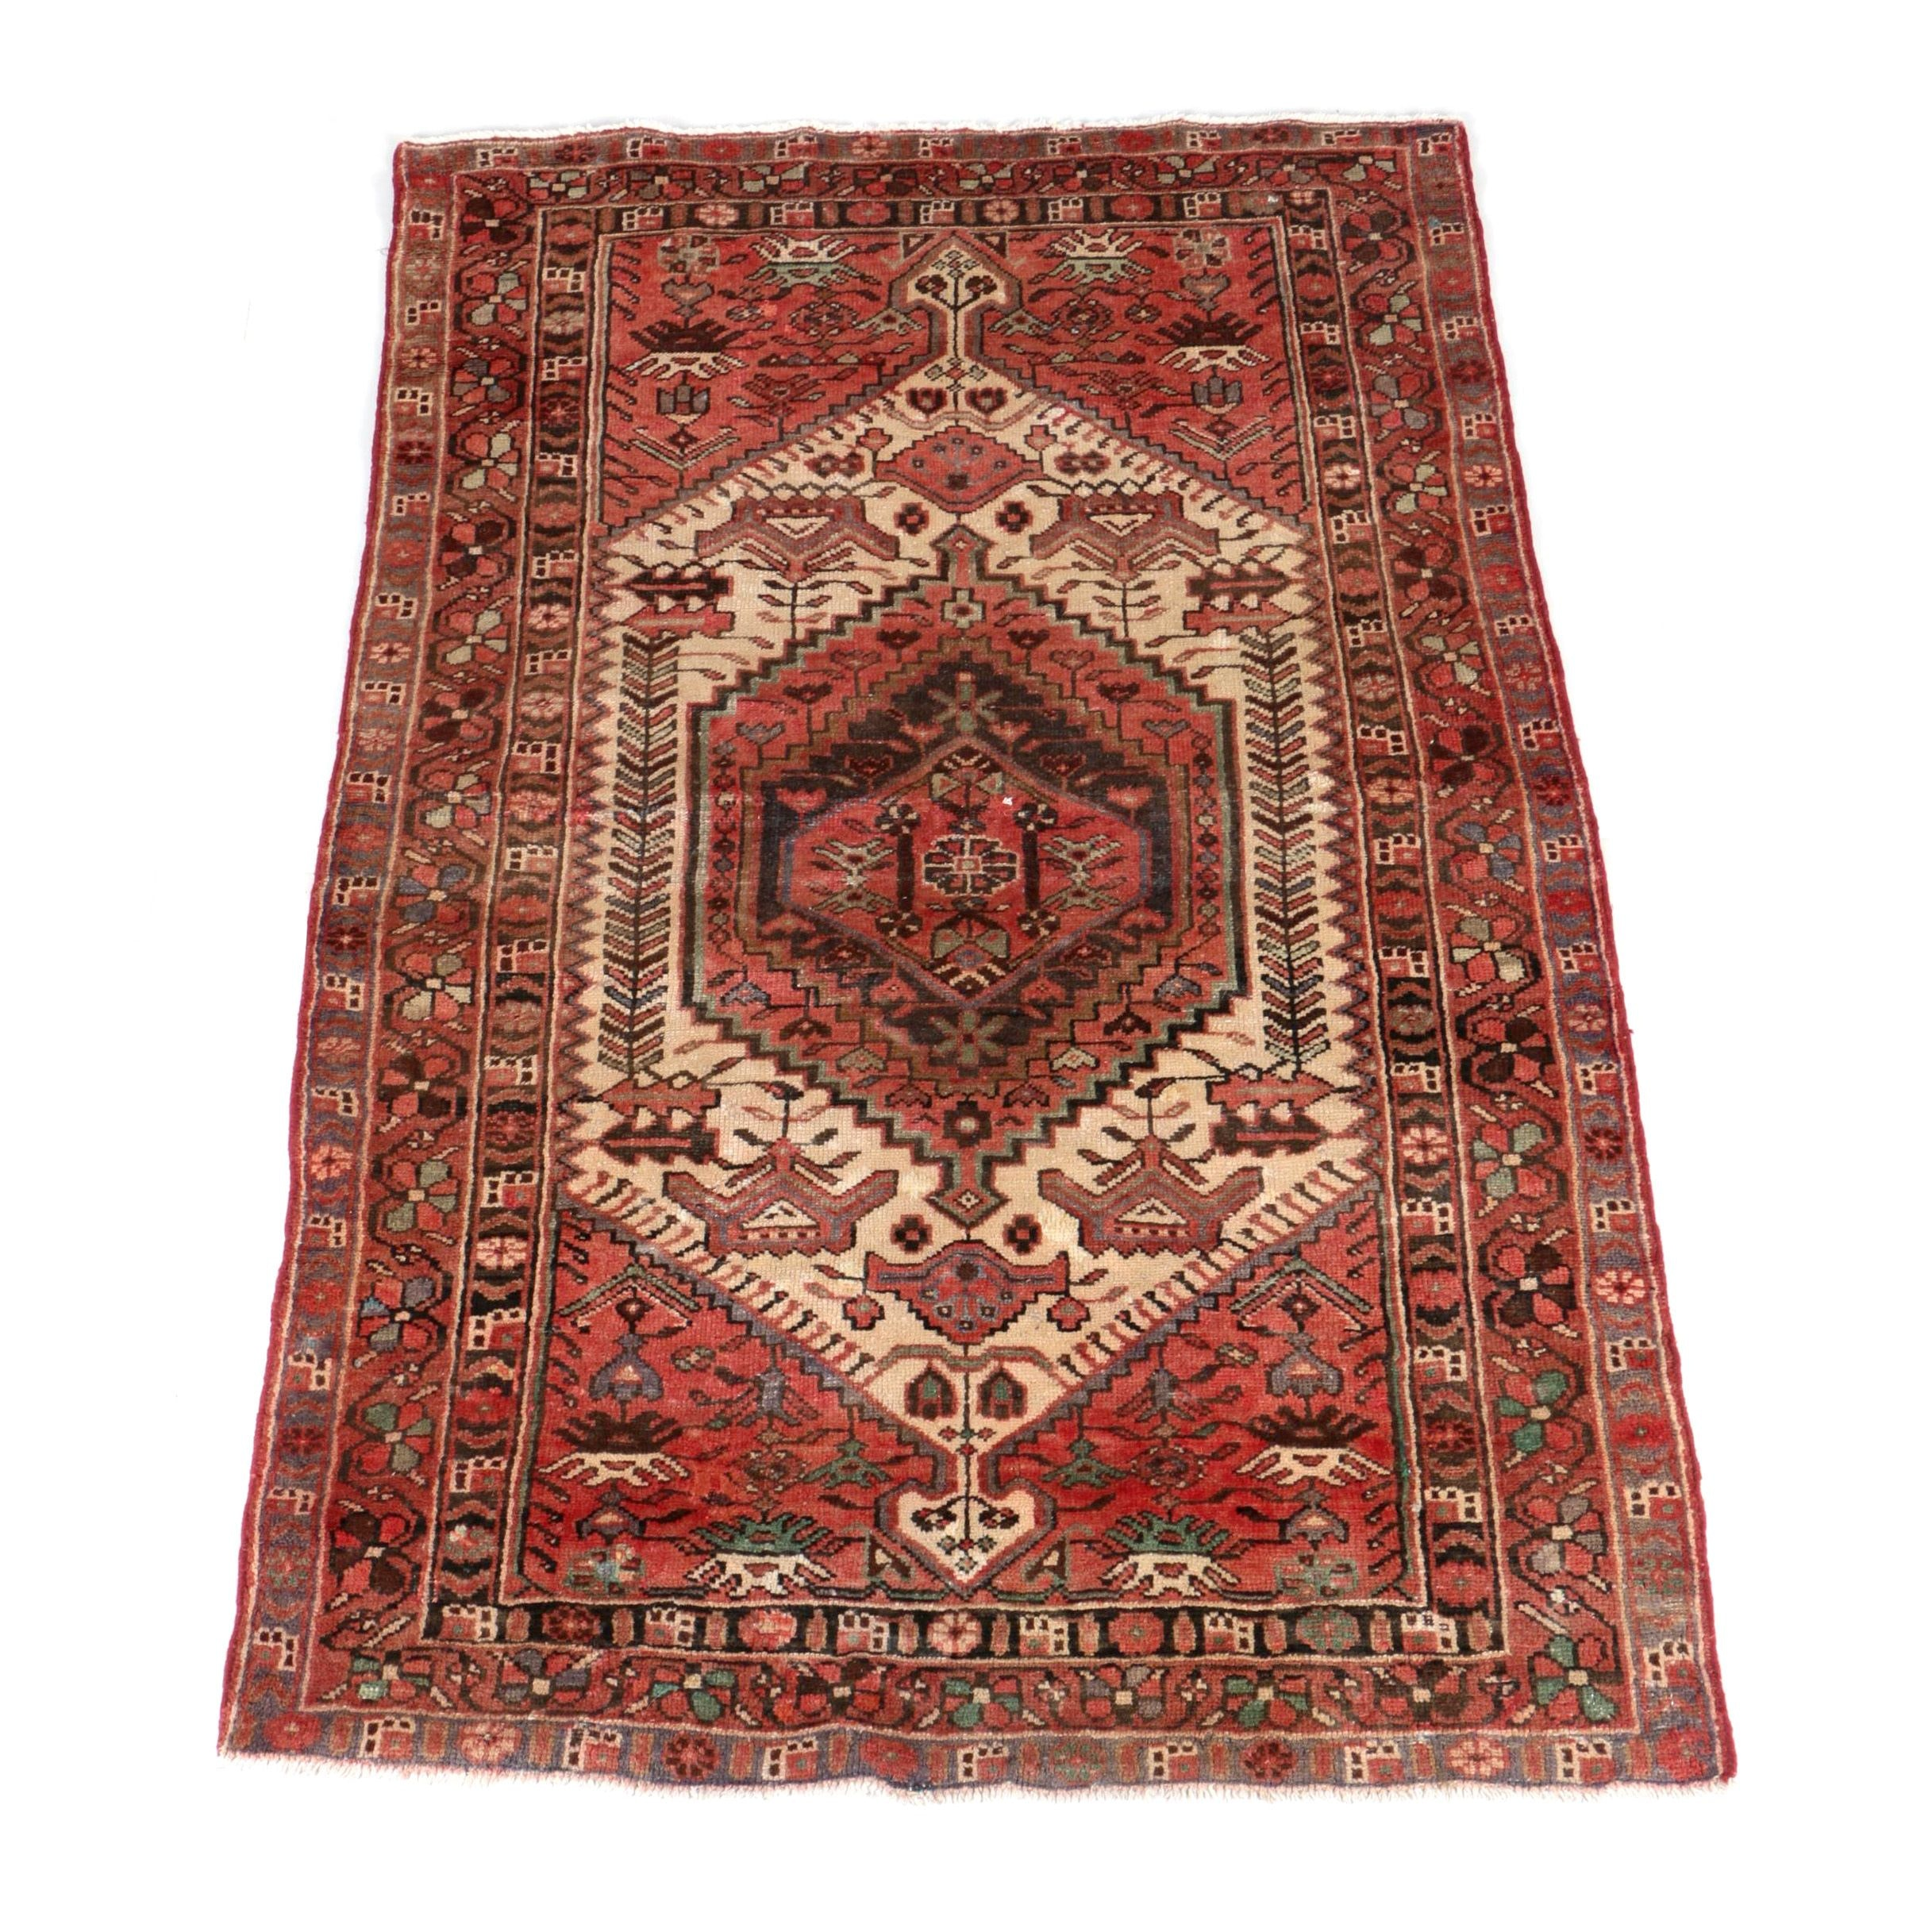 Vintage Handwoven Persian Kurdish Bijar Wool Area Rug